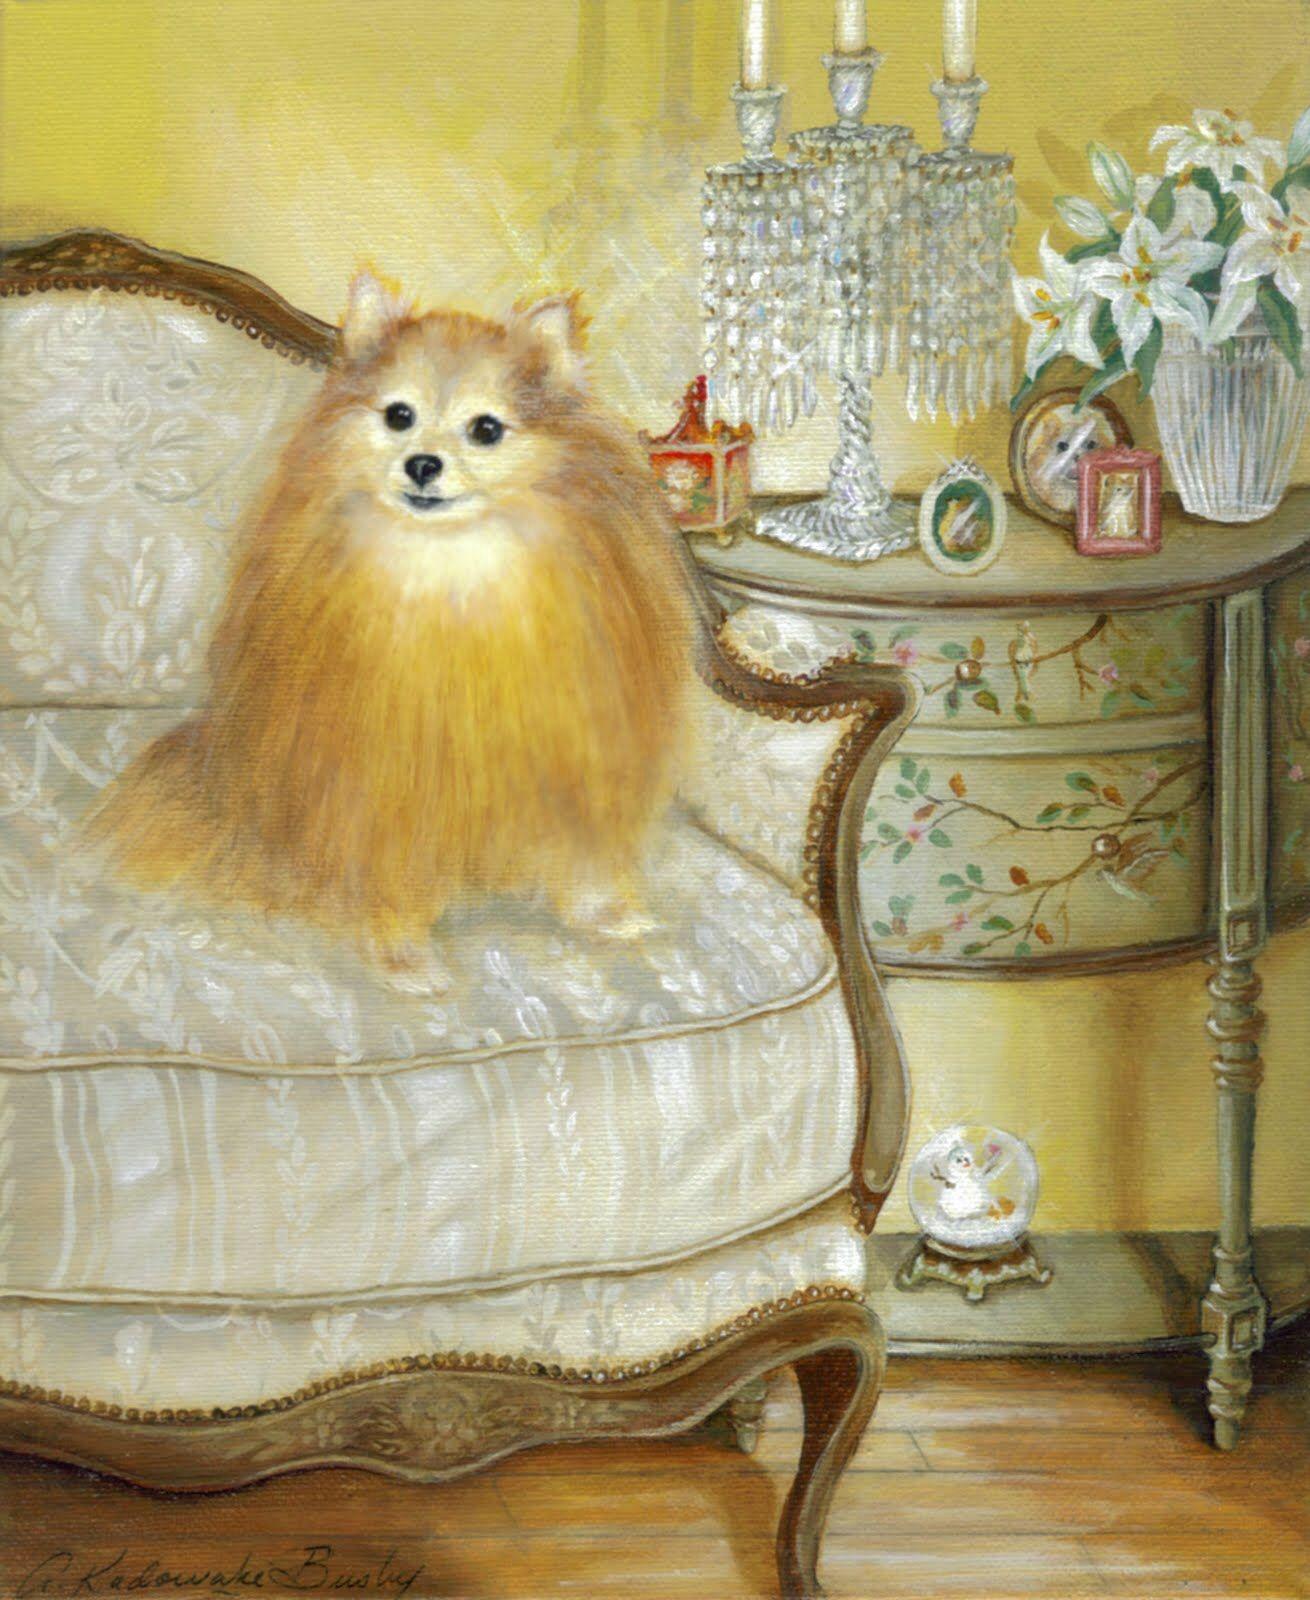 Pomeranian named Beauty - commission portrait. Sold | Wall Art ...